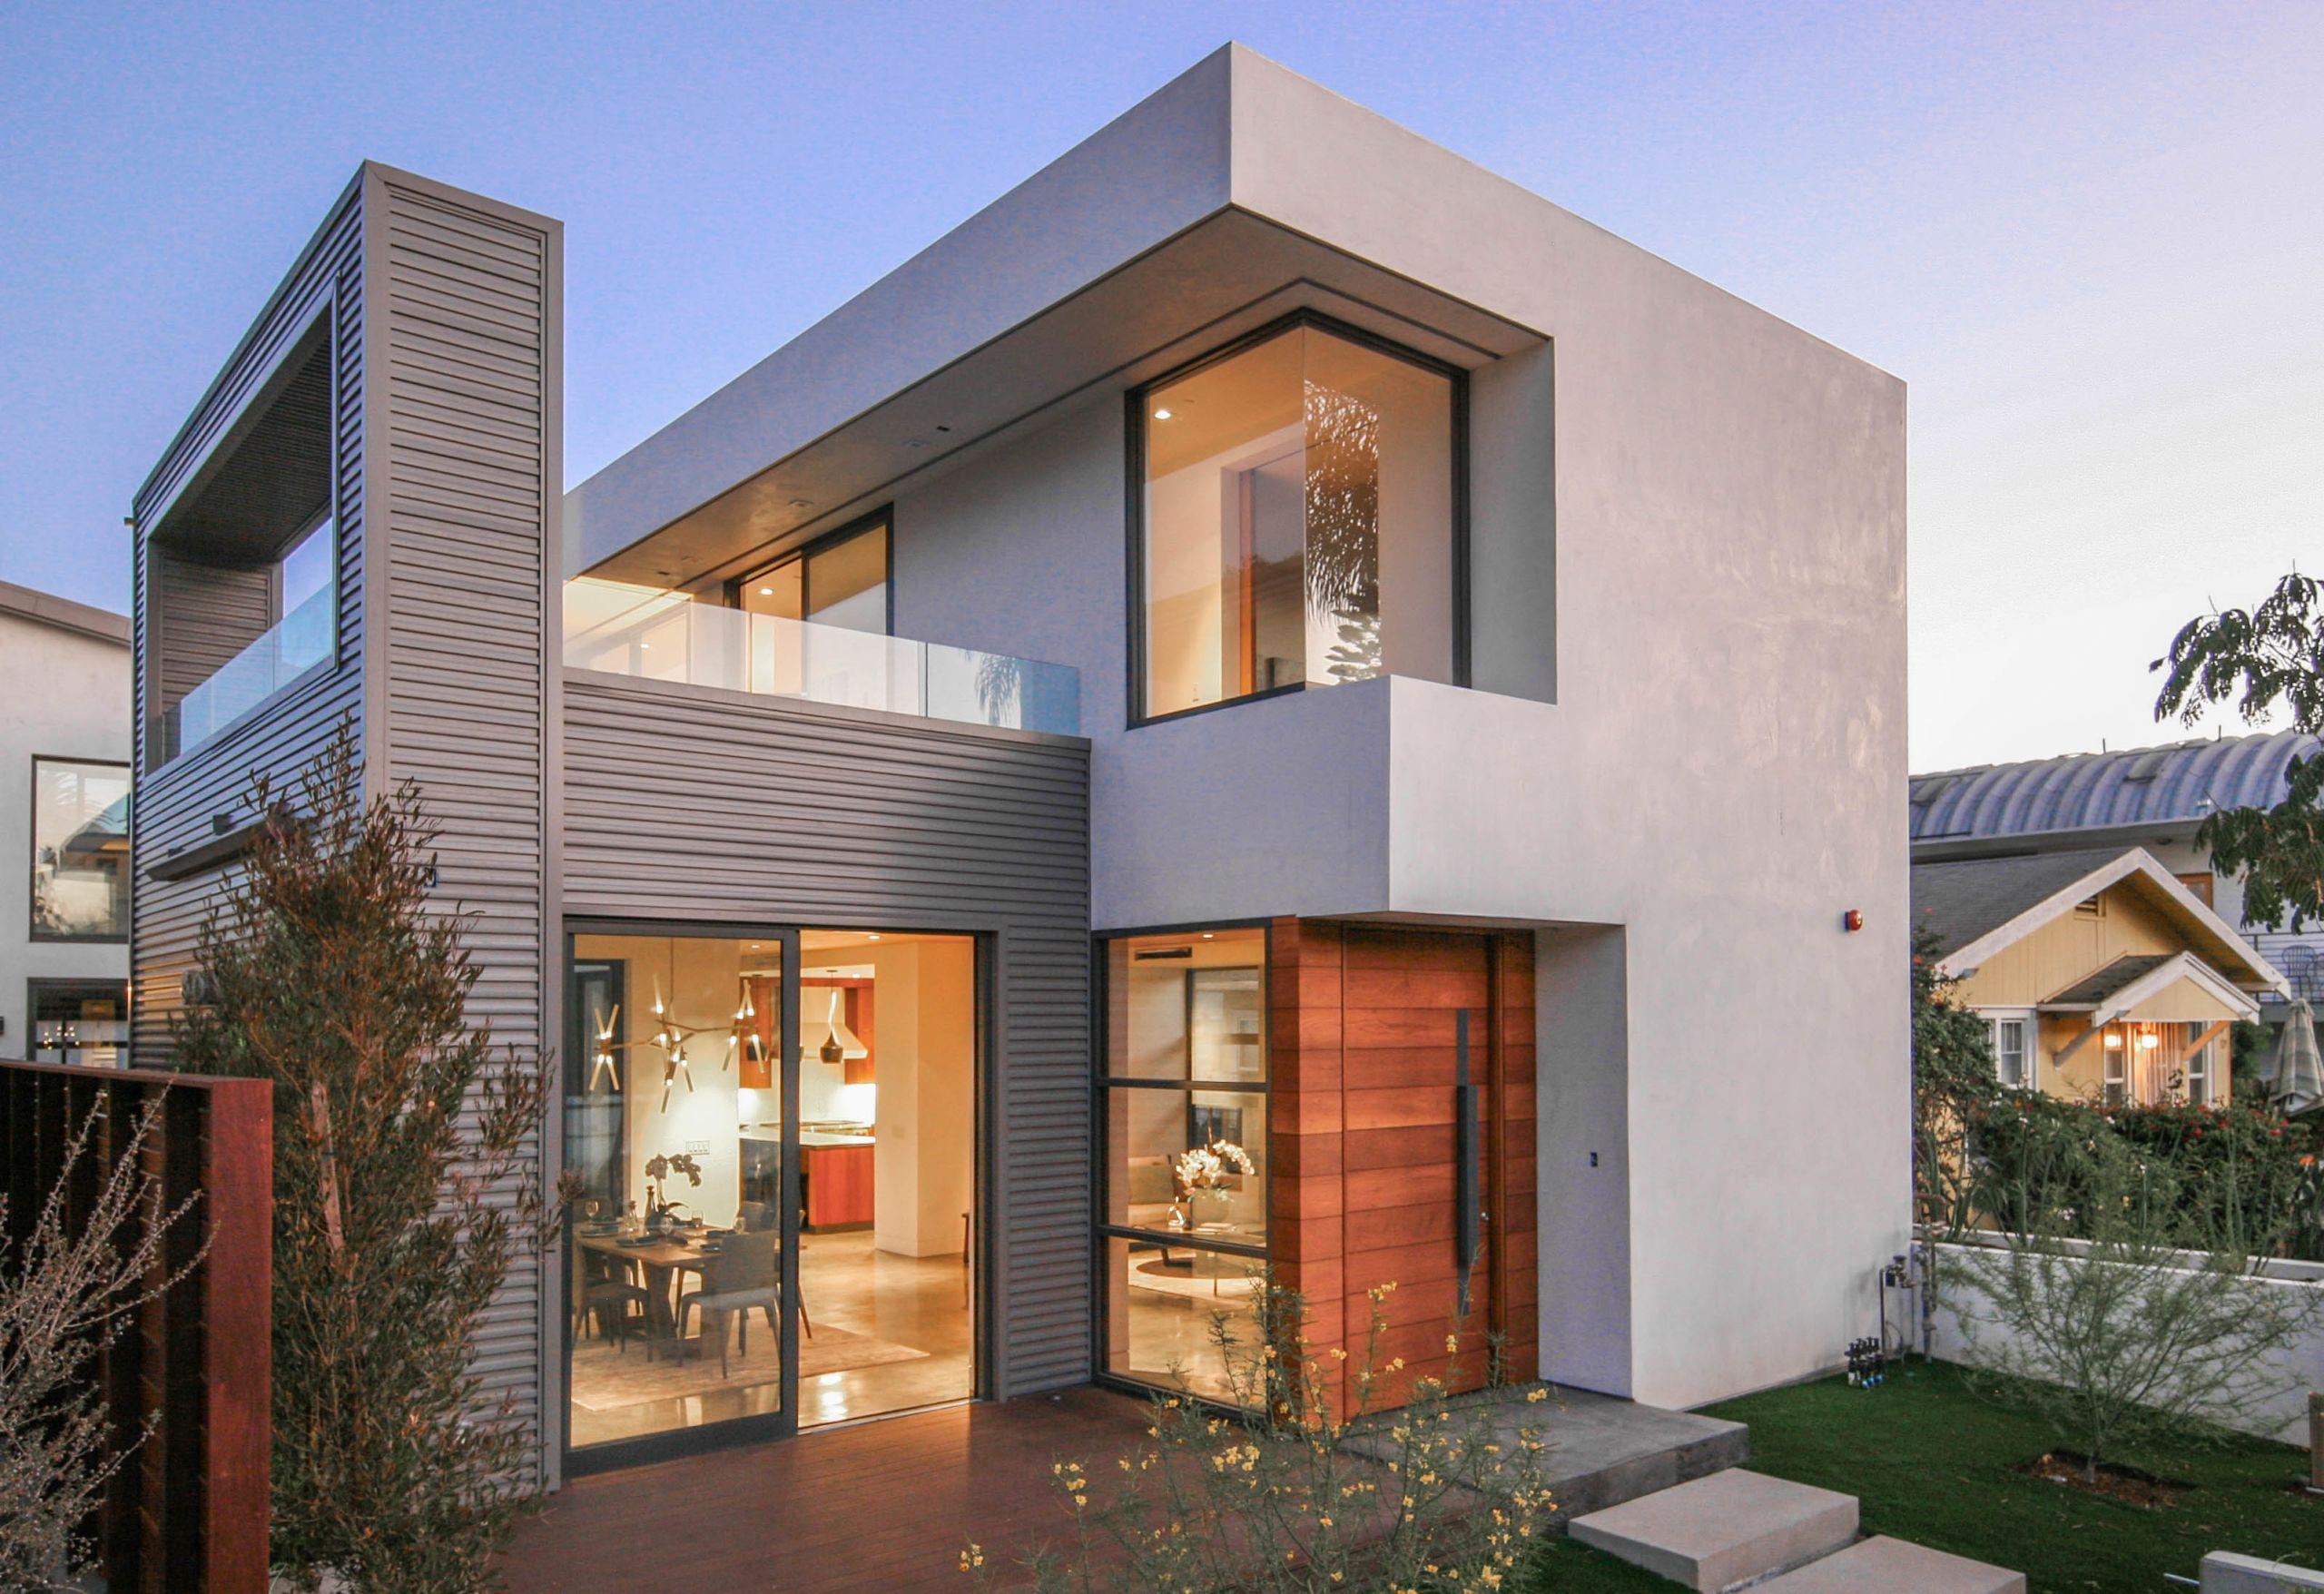 521 Vernon Ave., Venice Beach - Stunning Custom Built Dream Home